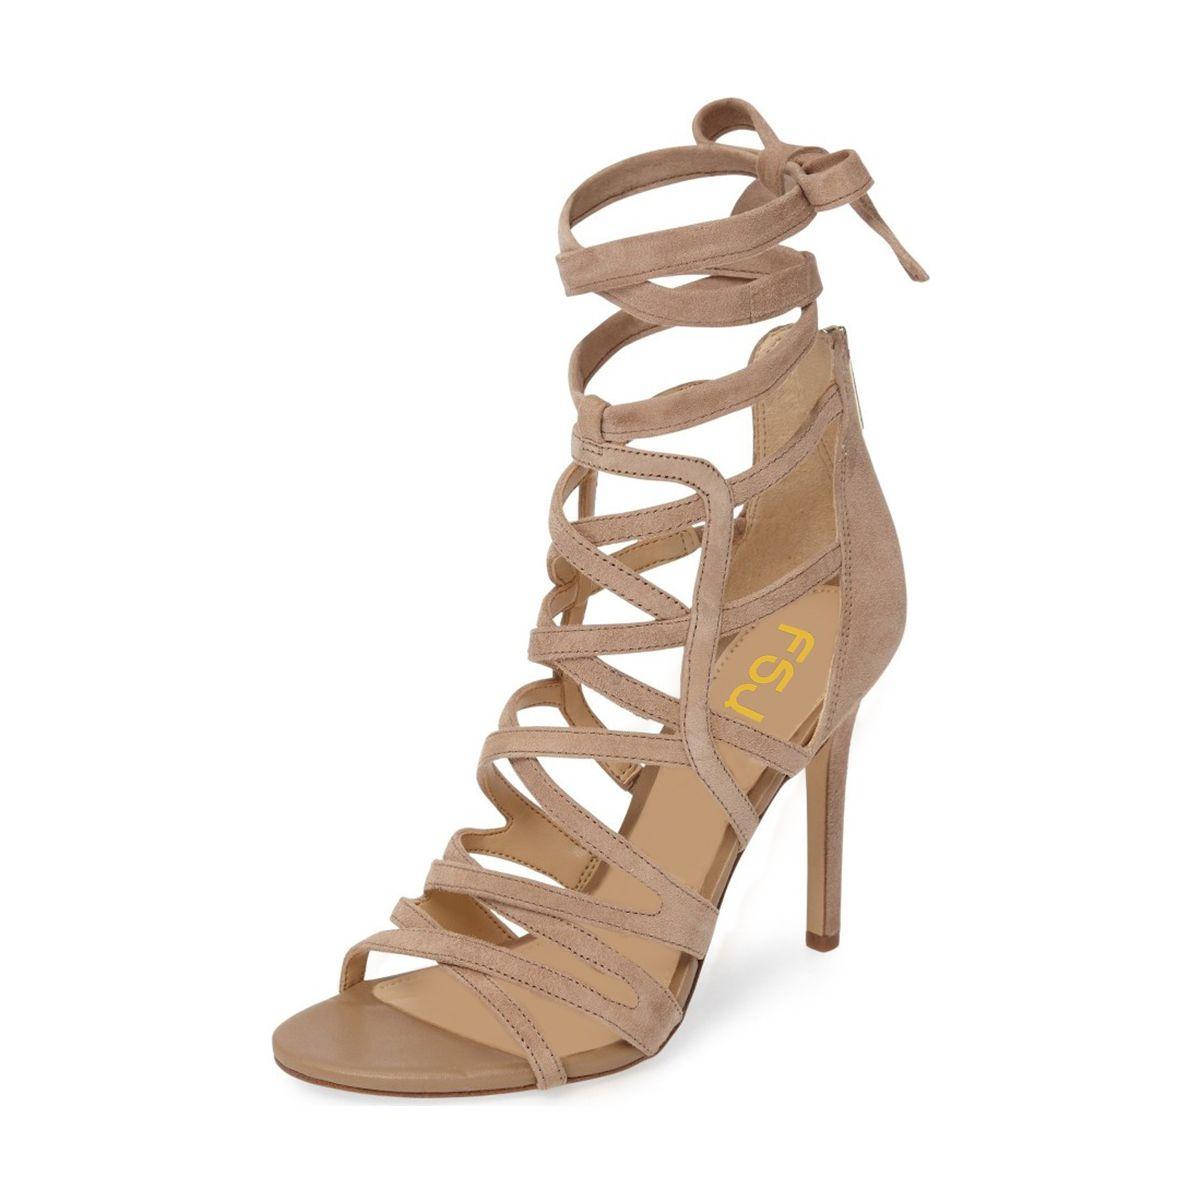 dbfe19fcd580  elegantshoegirl  peeptoeheels Love these Khaki Strappy Sandals Sexy Open  Toe Suede Women s Stiletto Heels